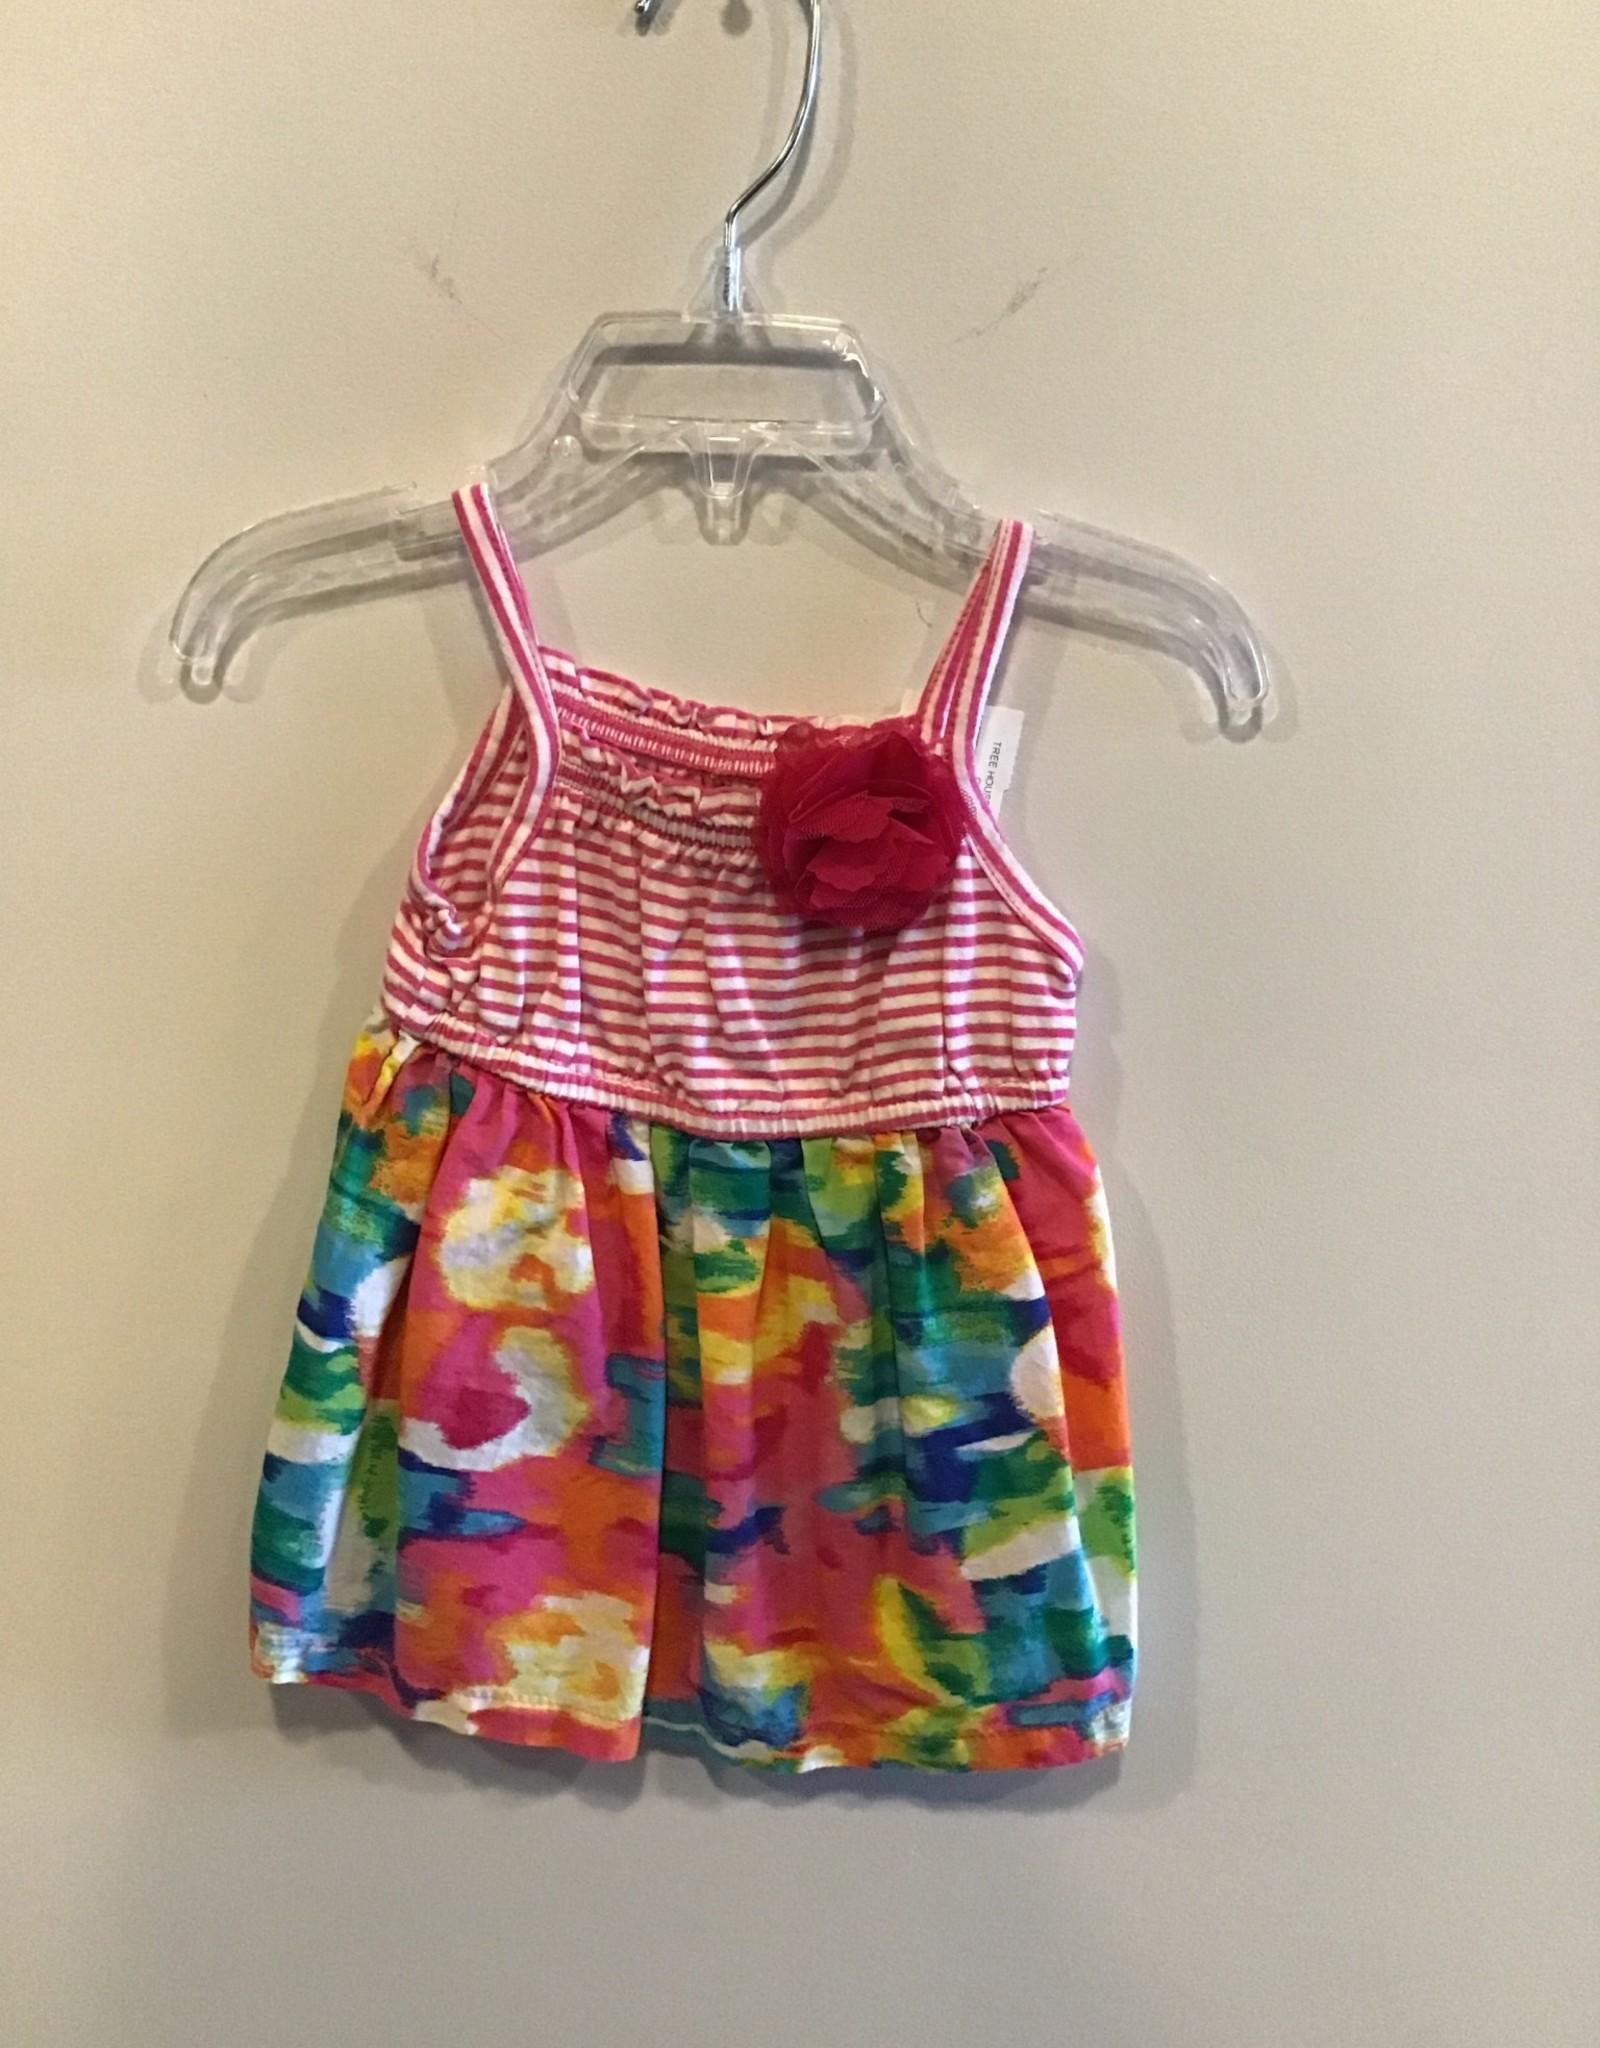 Children's Place Girls/2T/Place/Shirt